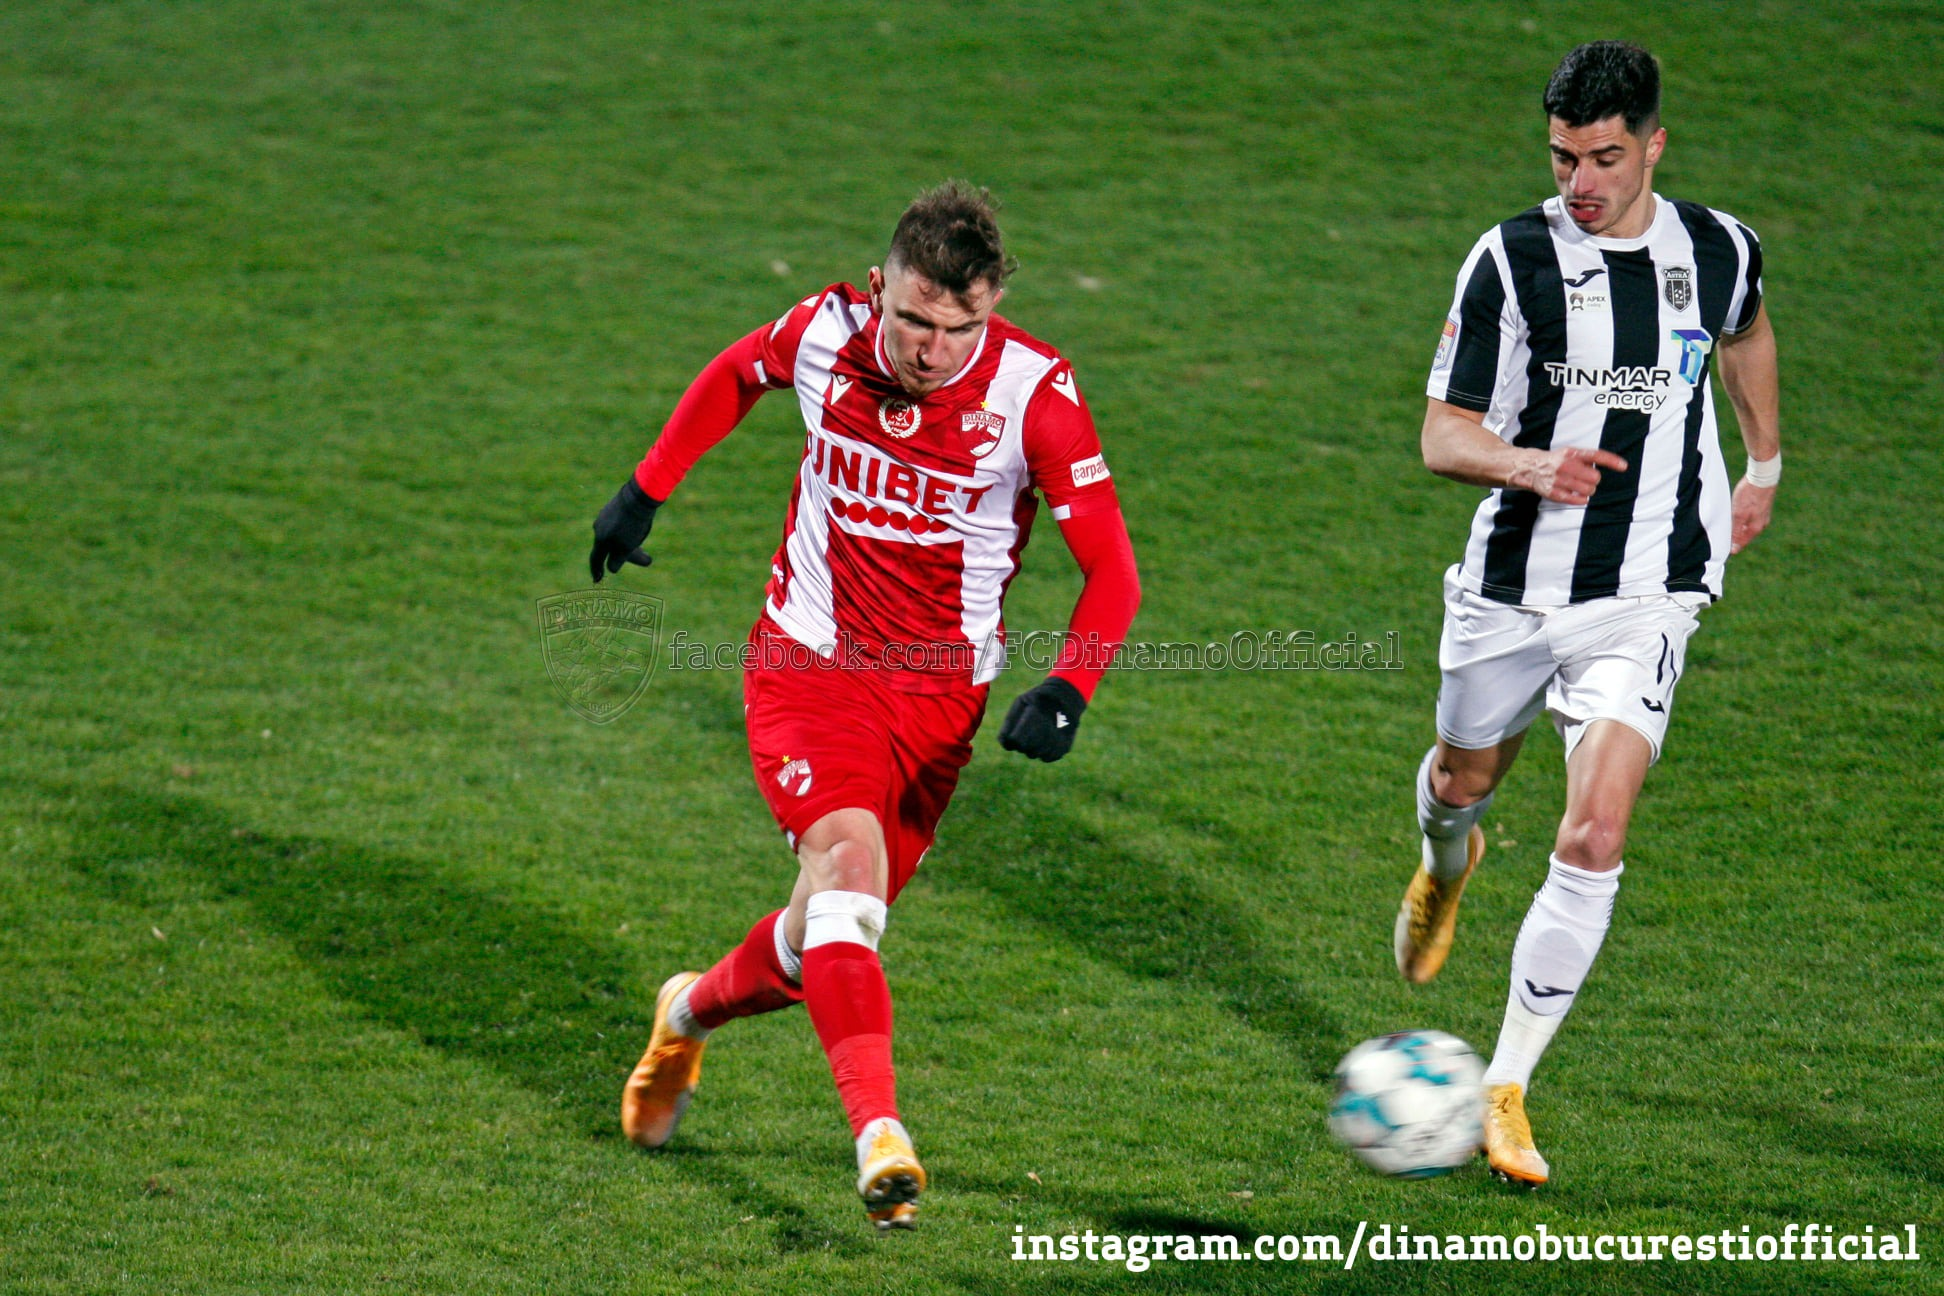 Dinamo1 2